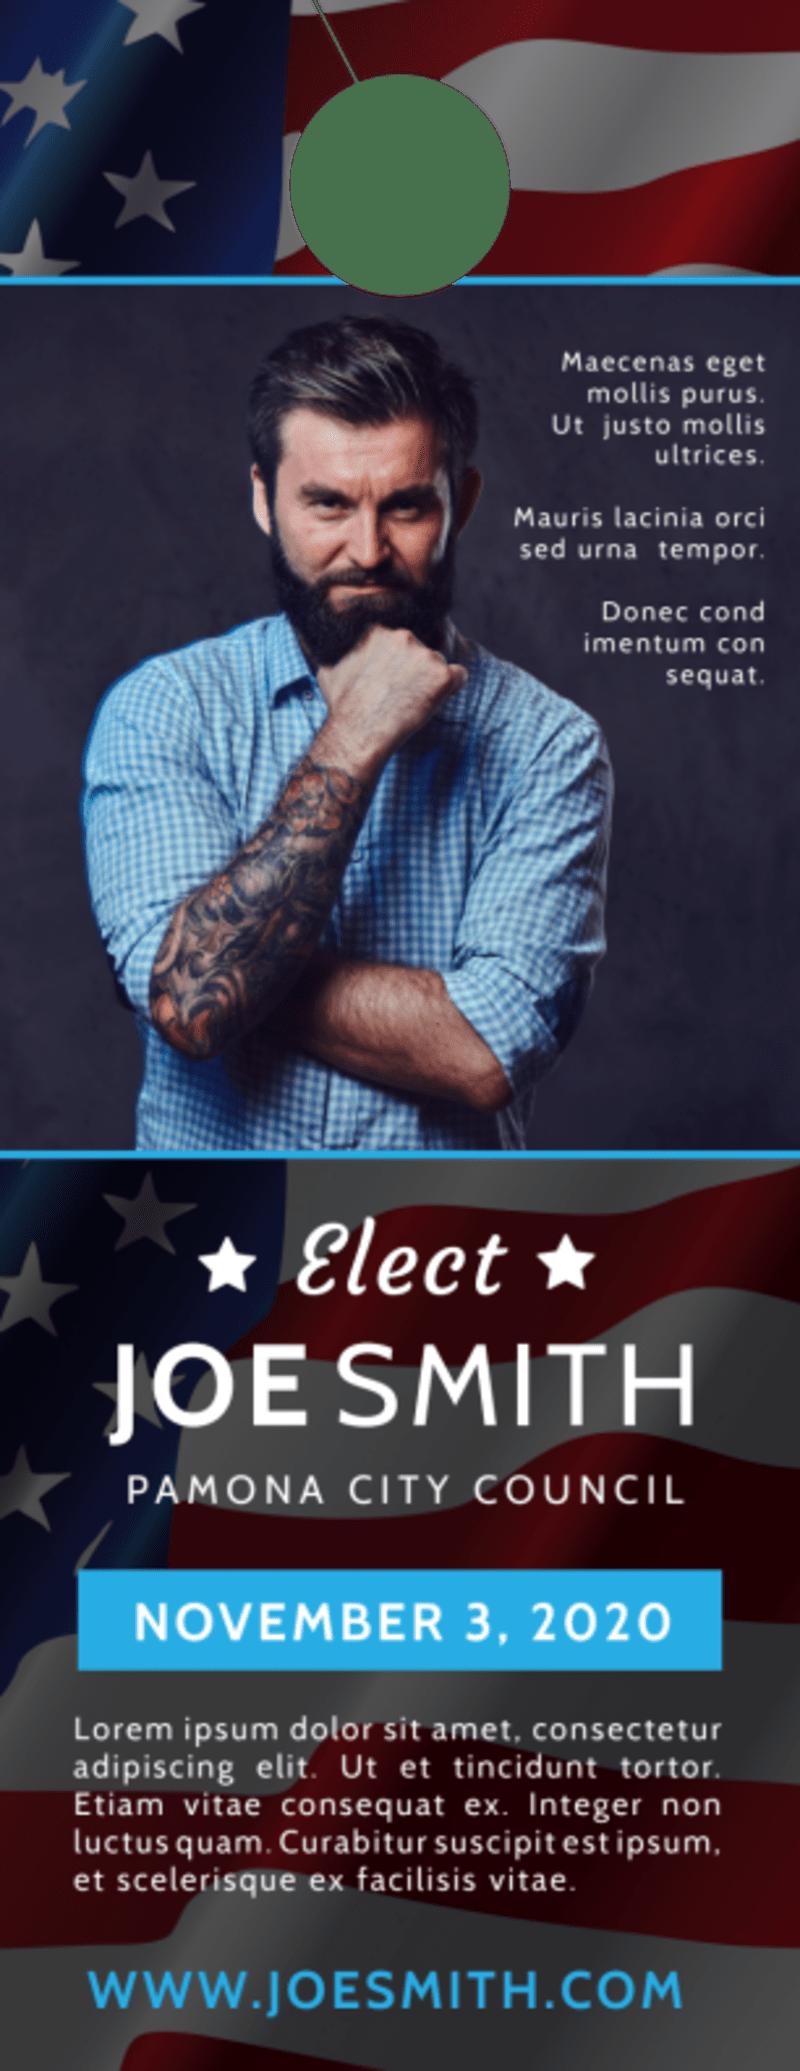 Elect Campaign Door Hanger Template Preview 2